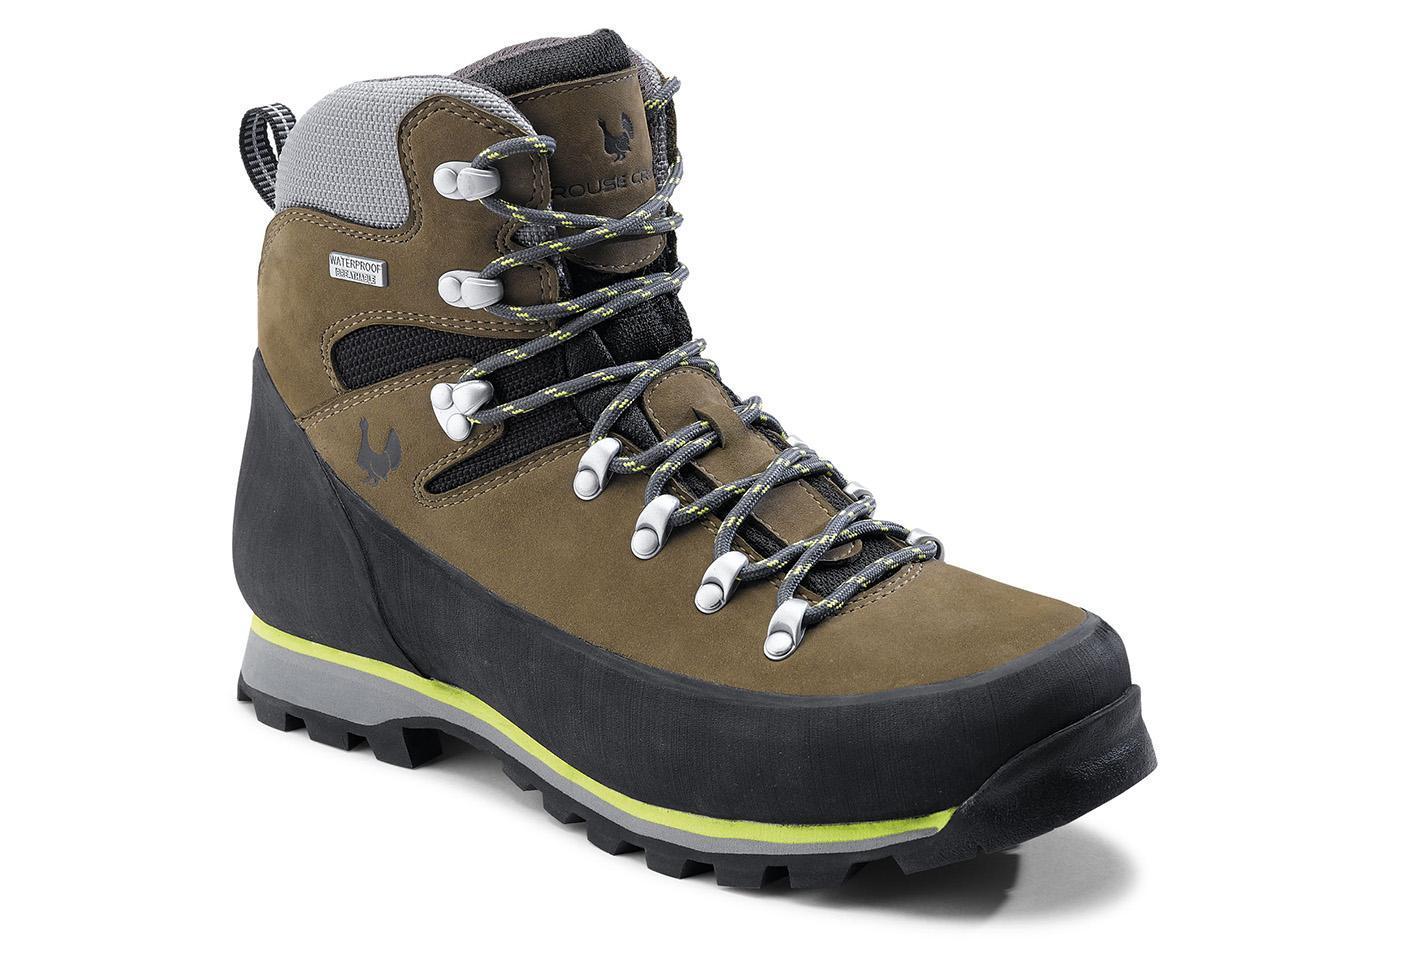 740b23c6b31 Scarponcini da trekking suola vibram water proof hiking shoes high